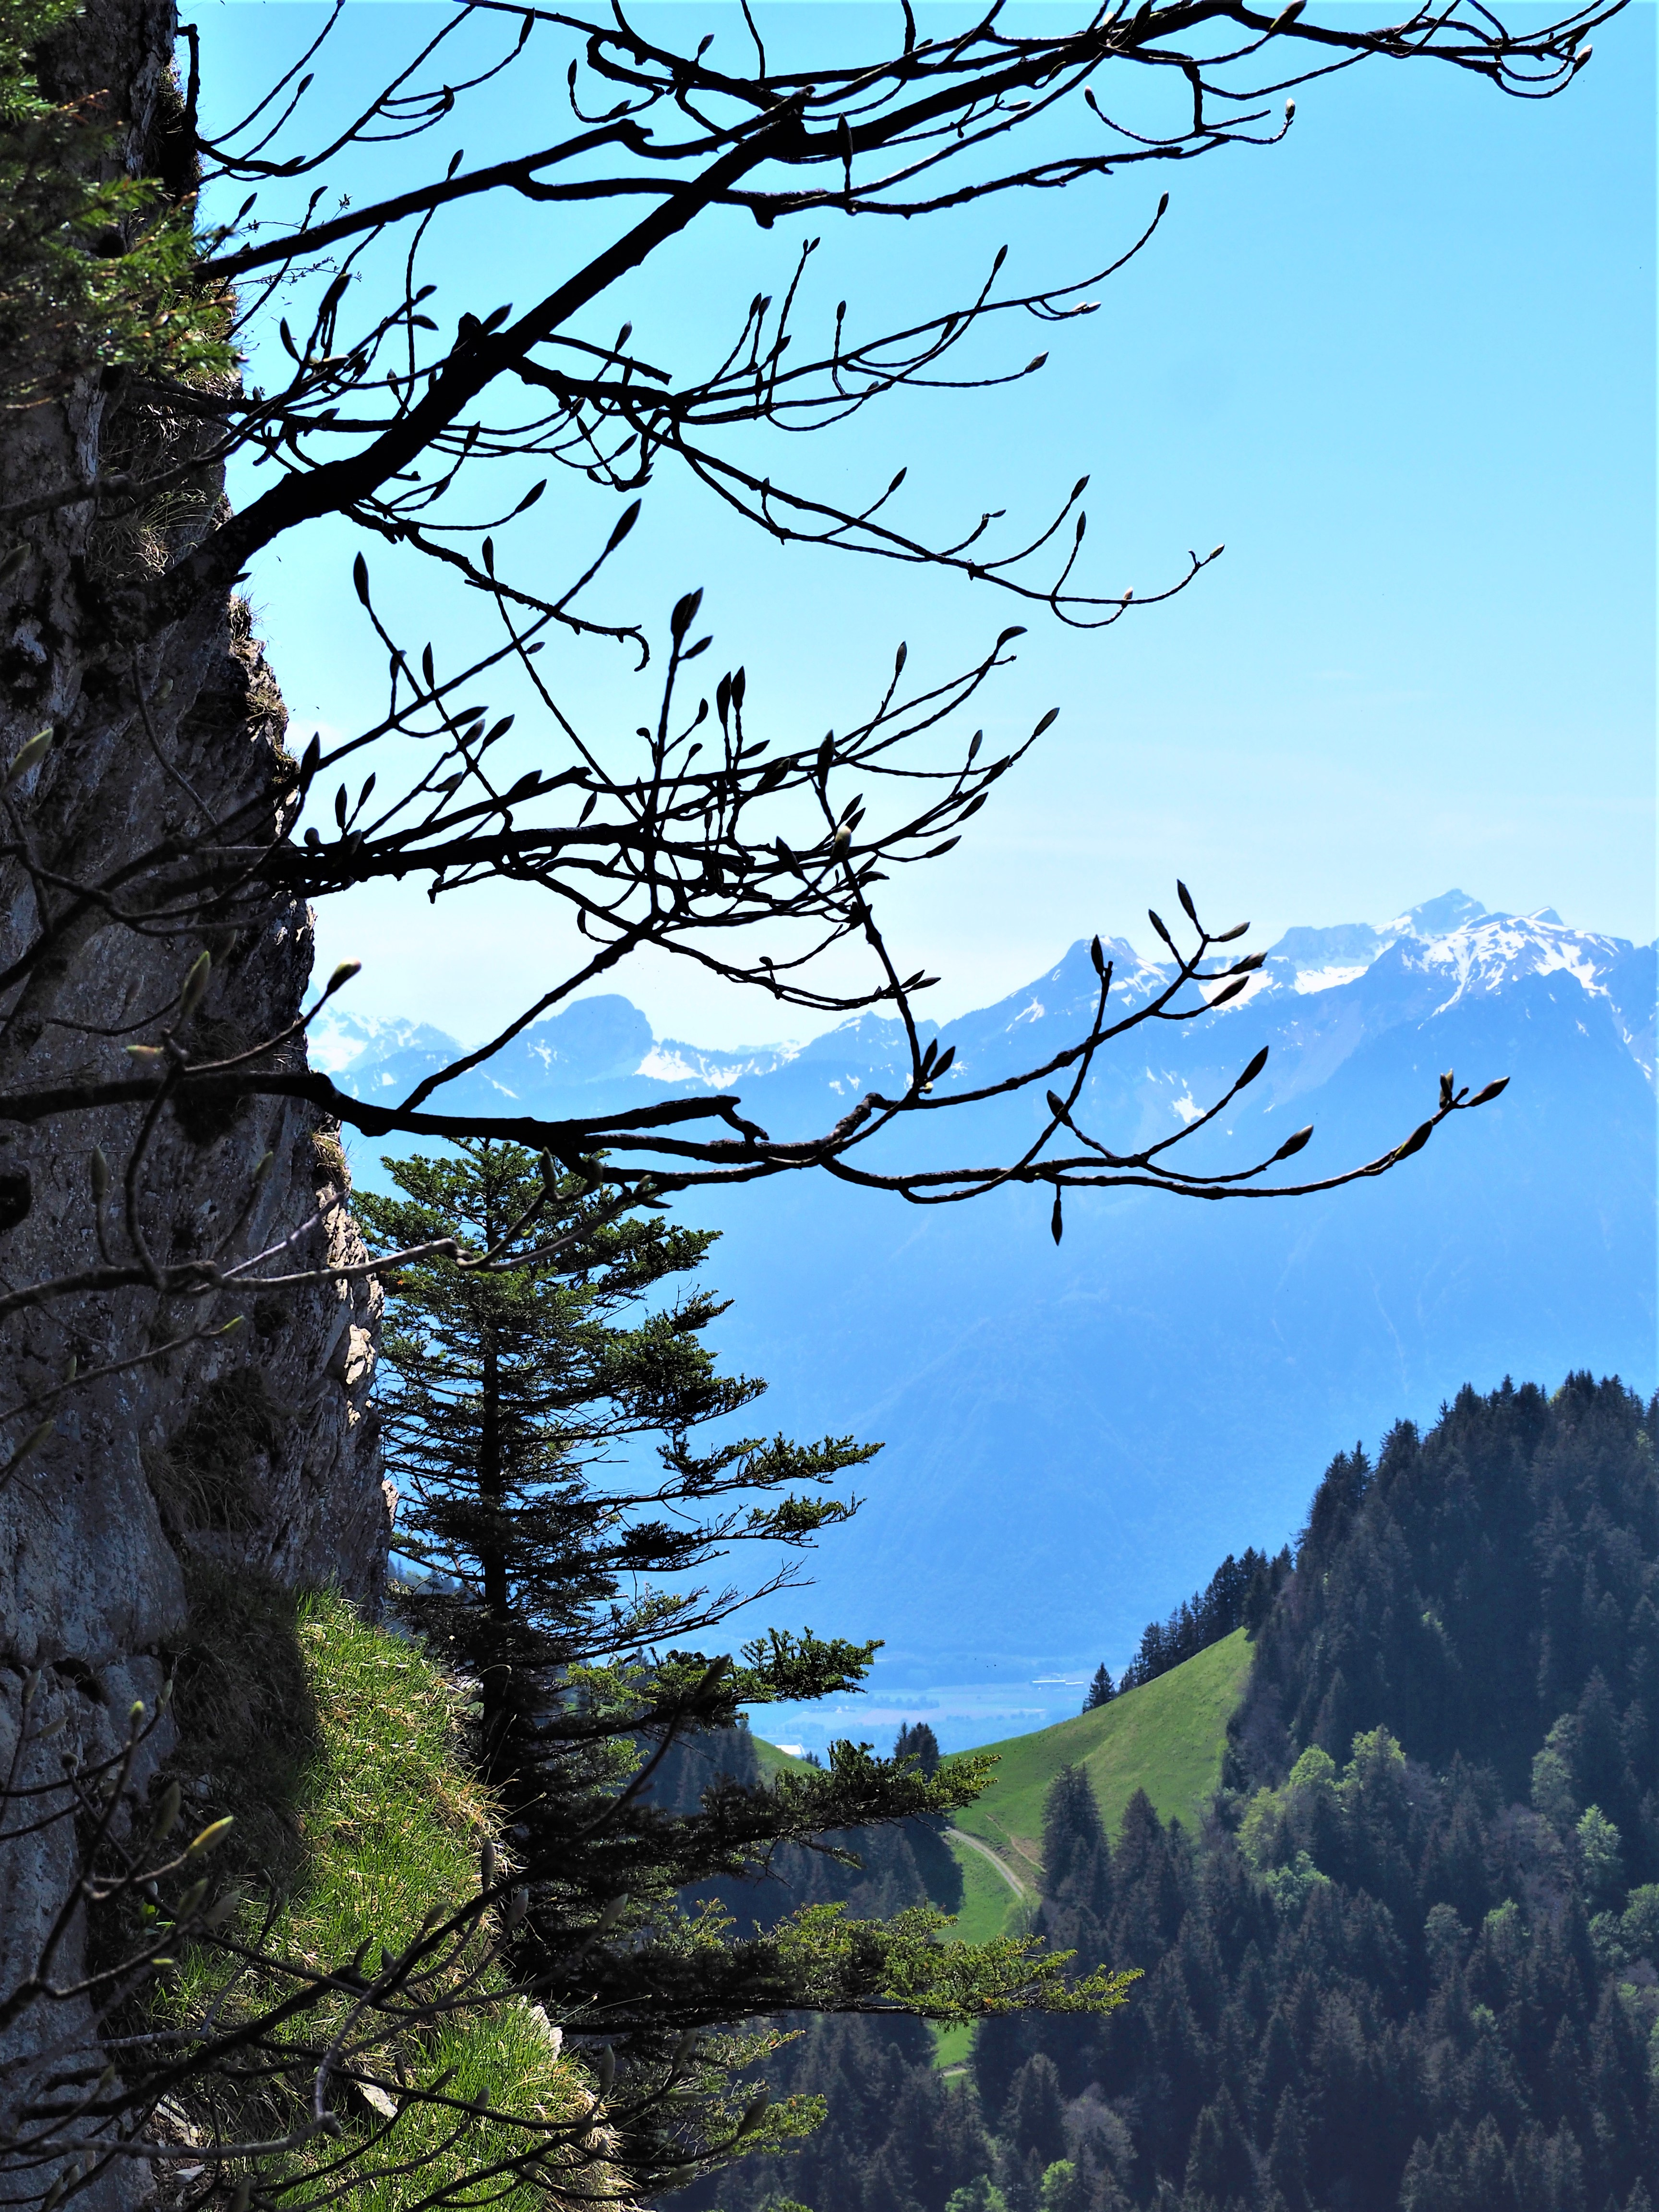 Randonnee-canton-de-Vaud-Dent-de-Jaman-paysage.